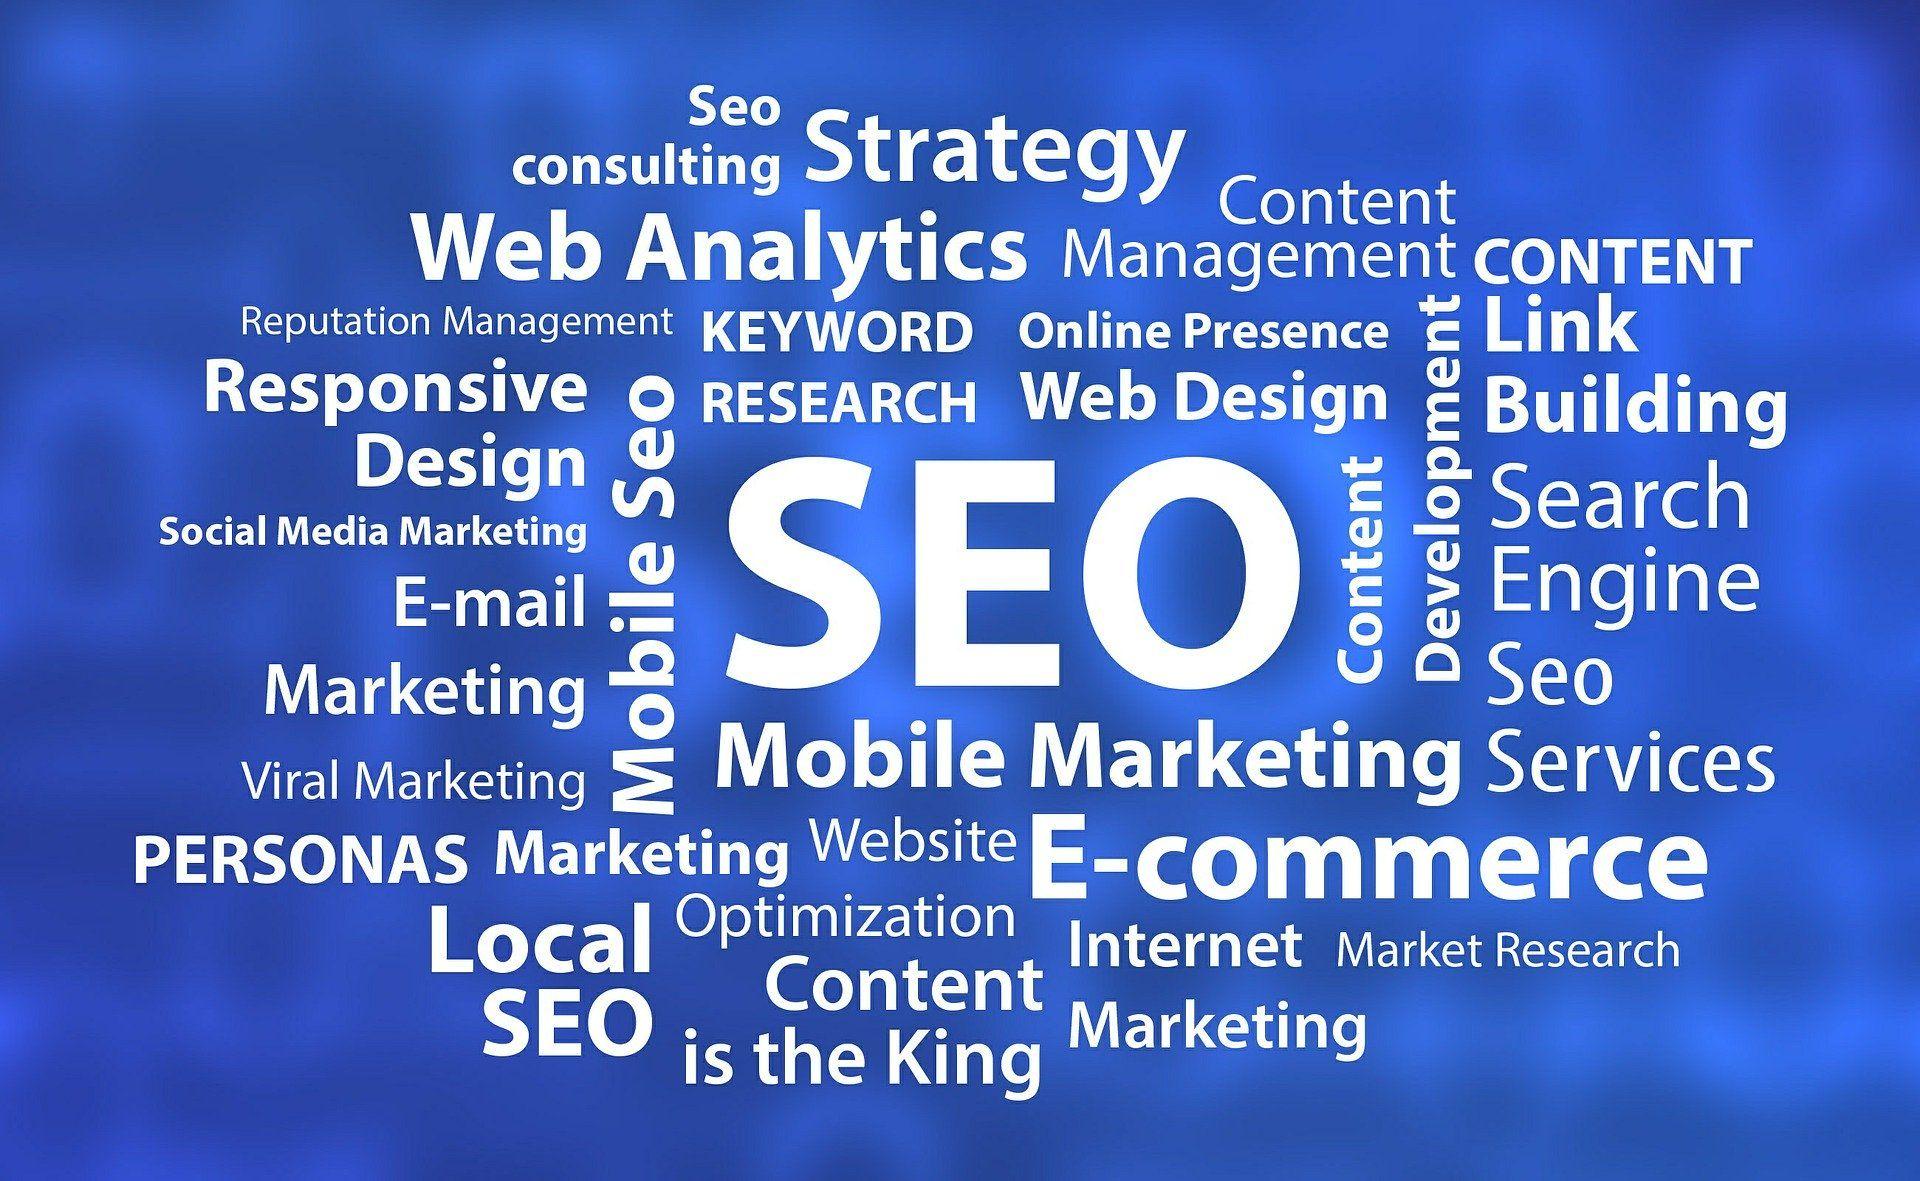 Moteurs de recherche - Google, Yandex, Bing, Yahoo